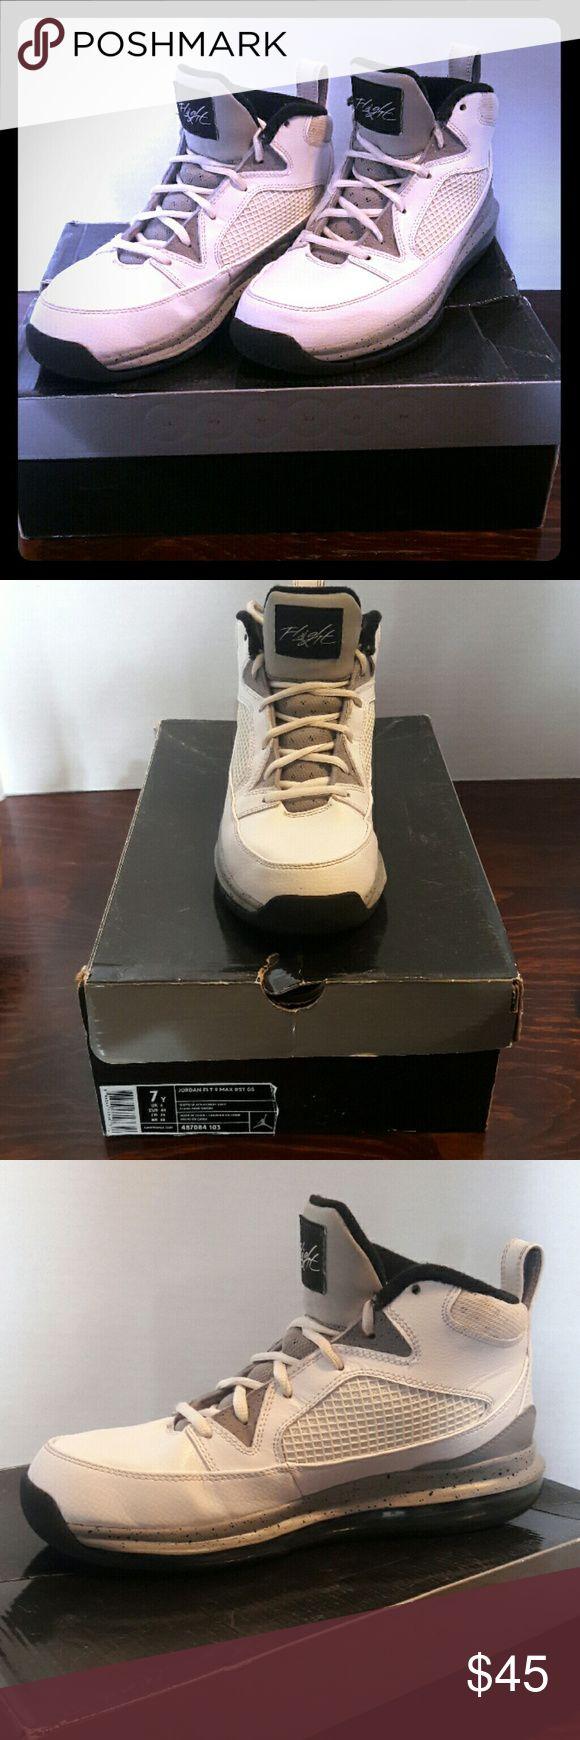 Jordan Flight 9 Barely worn basketball/court shoes, good grip, full length air unit bottoms, original box. Only worn indoors. Jordan Shoes Sneakers